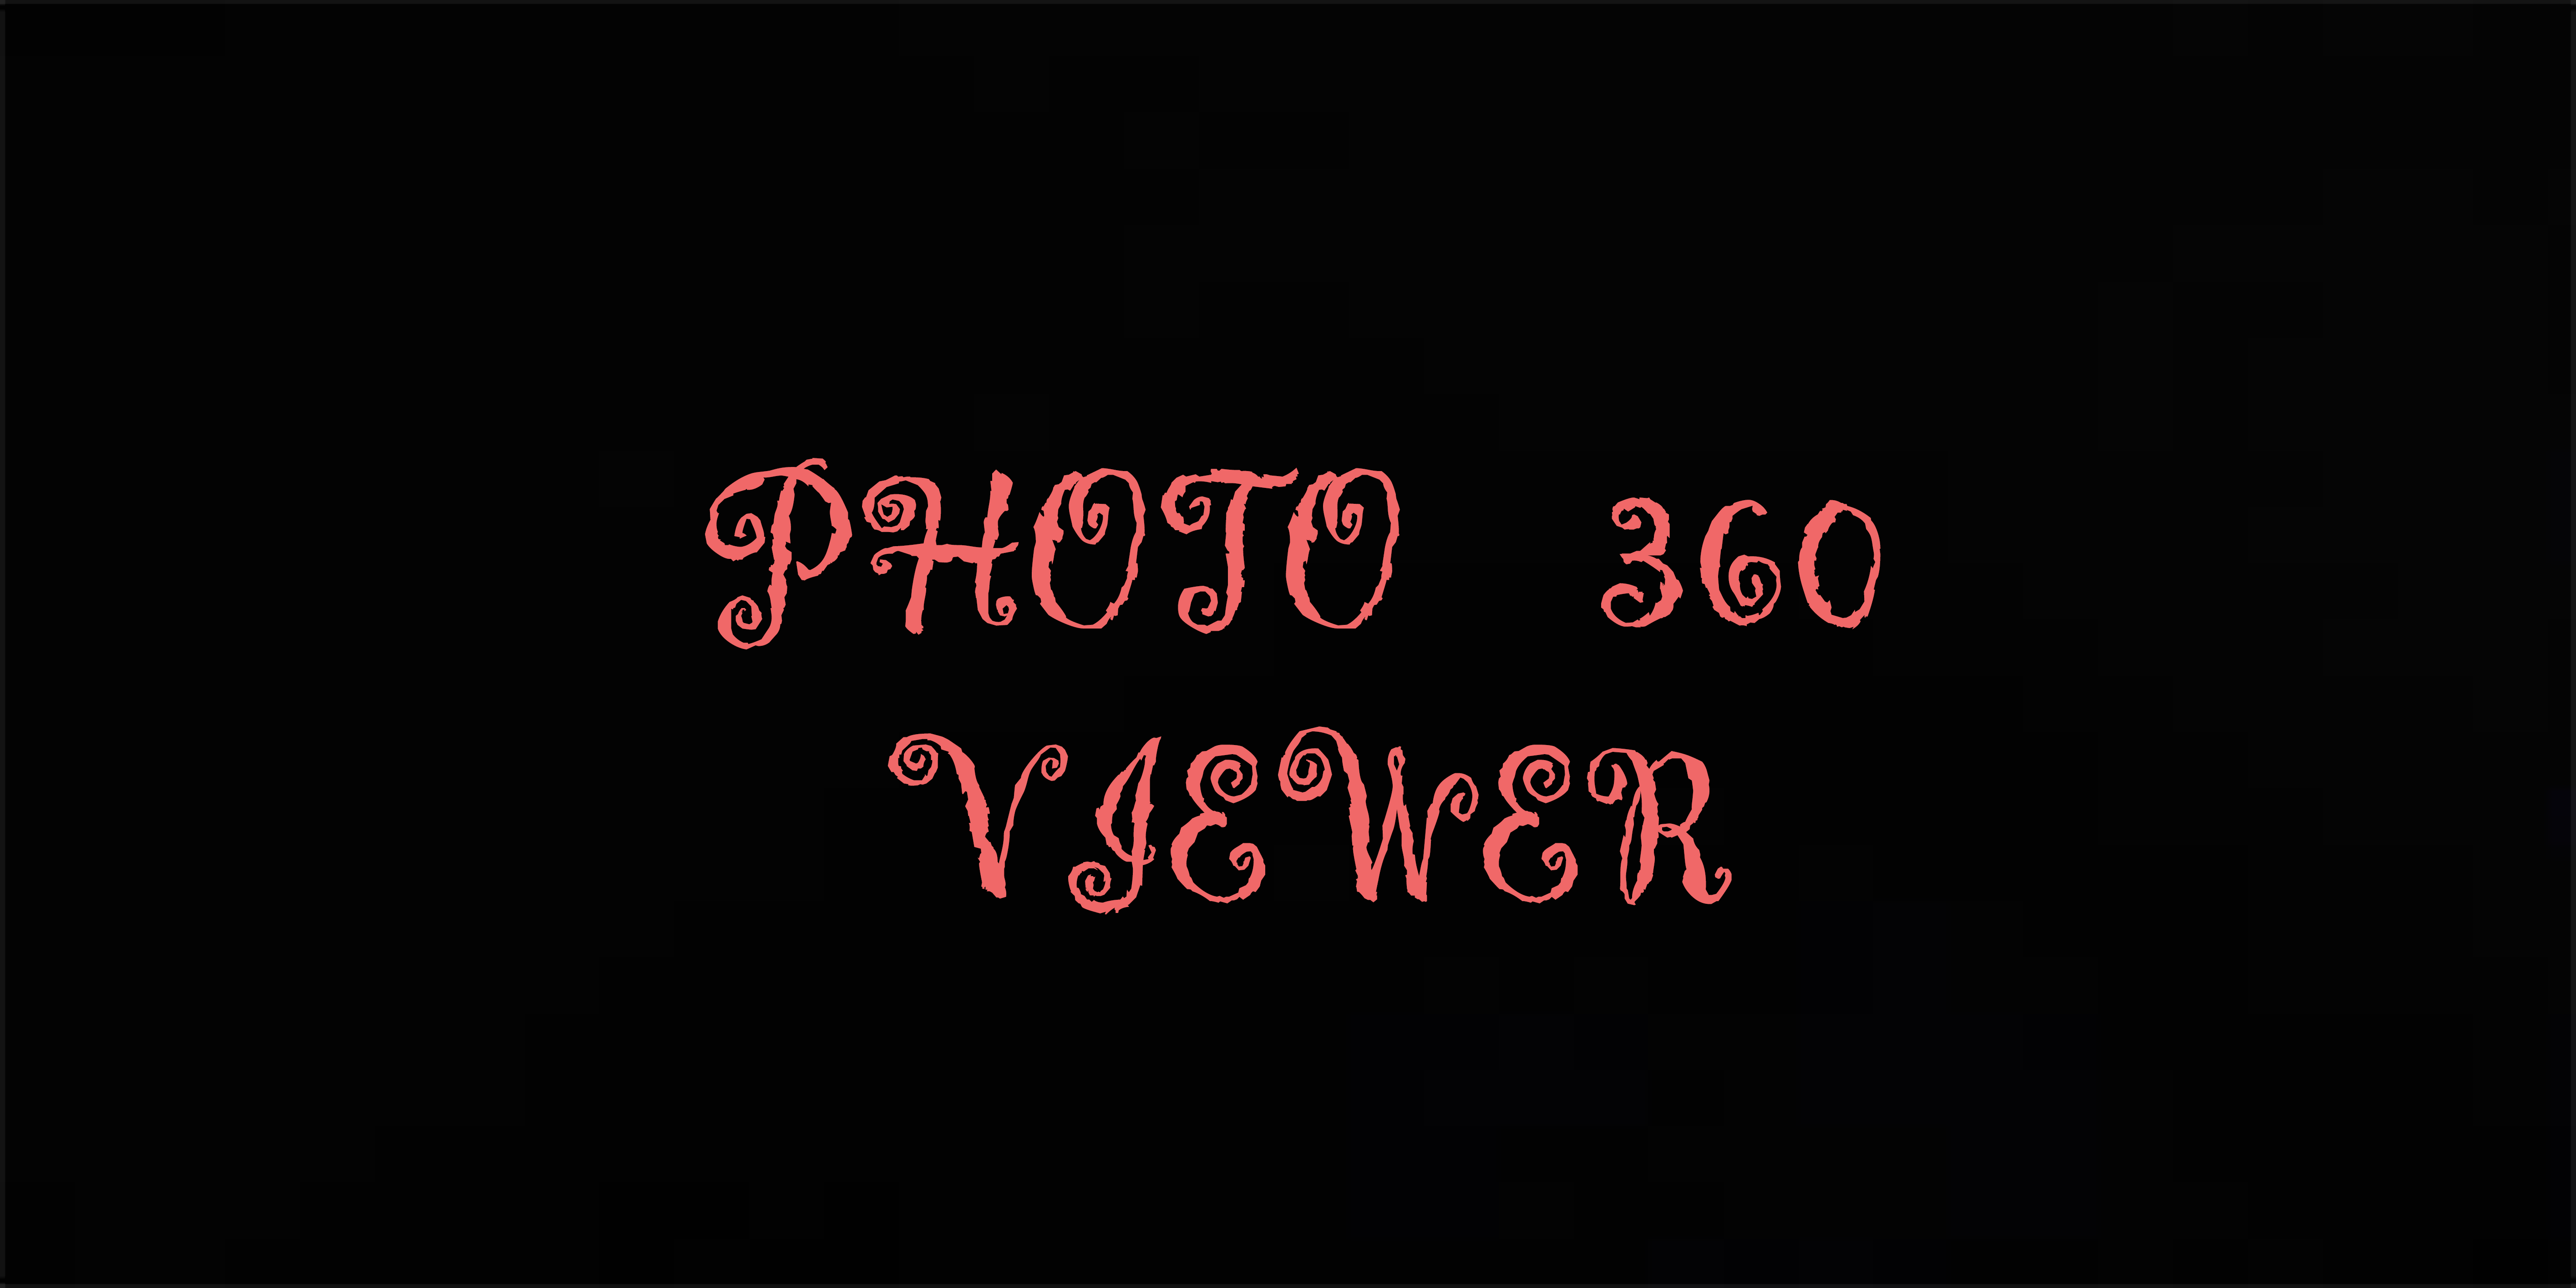 PHOTO 360 VIEWER